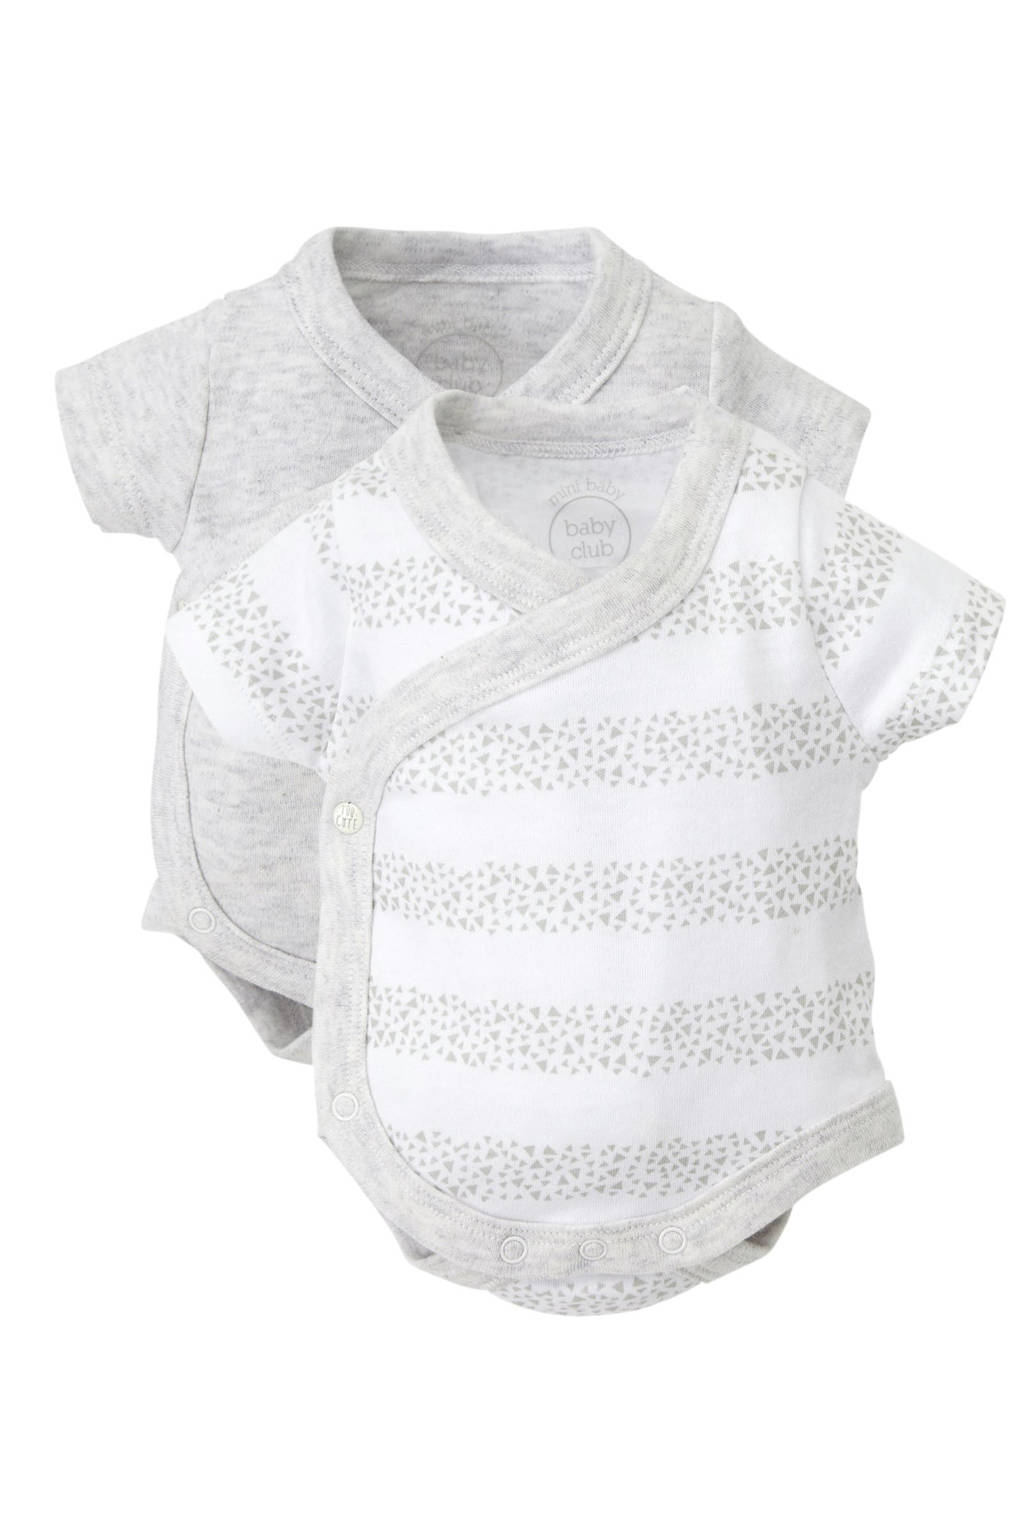 C&A Baby Newborn romper - set van 2, Wit/ lichtgrijs melange